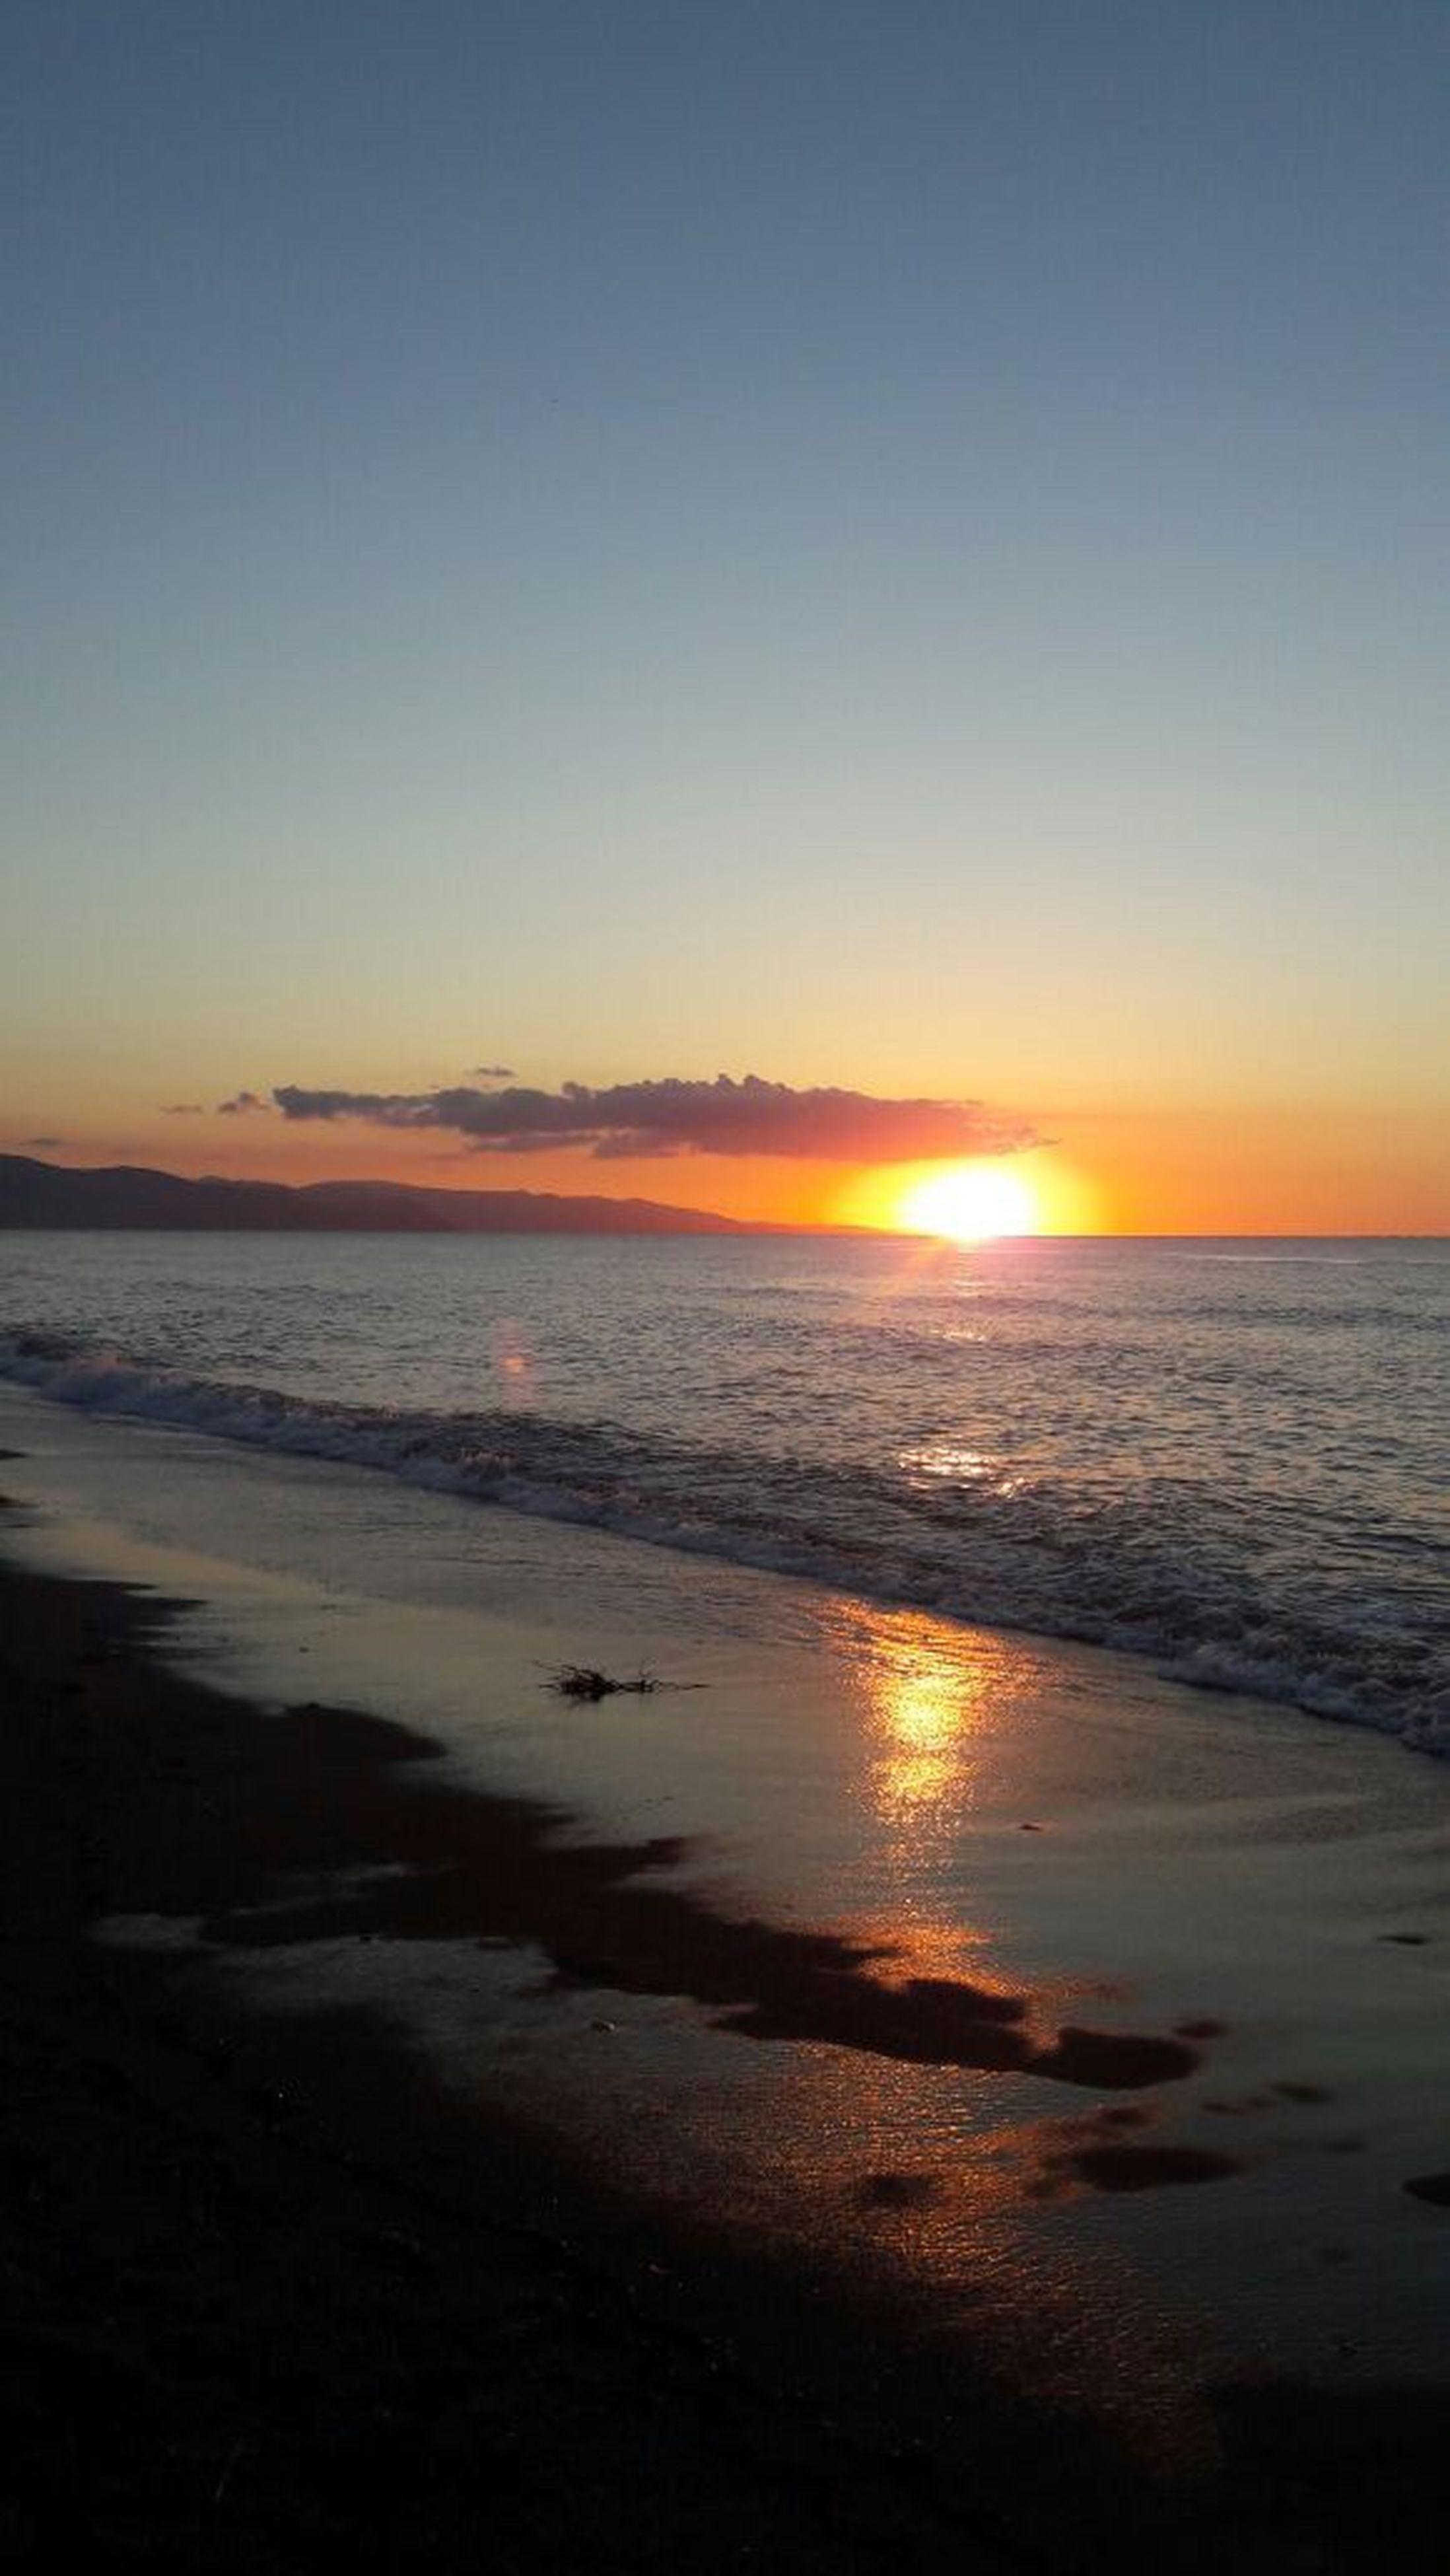 sunset, sea, water, beach, horizon over water, scenics, tranquil scene, shore, beauty in nature, tranquility, sun, orange color, sky, idyllic, nature, wave, coastline, outdoors, remote, calm, no people, non-urban scene, seascape, ocean, majestic, tourism